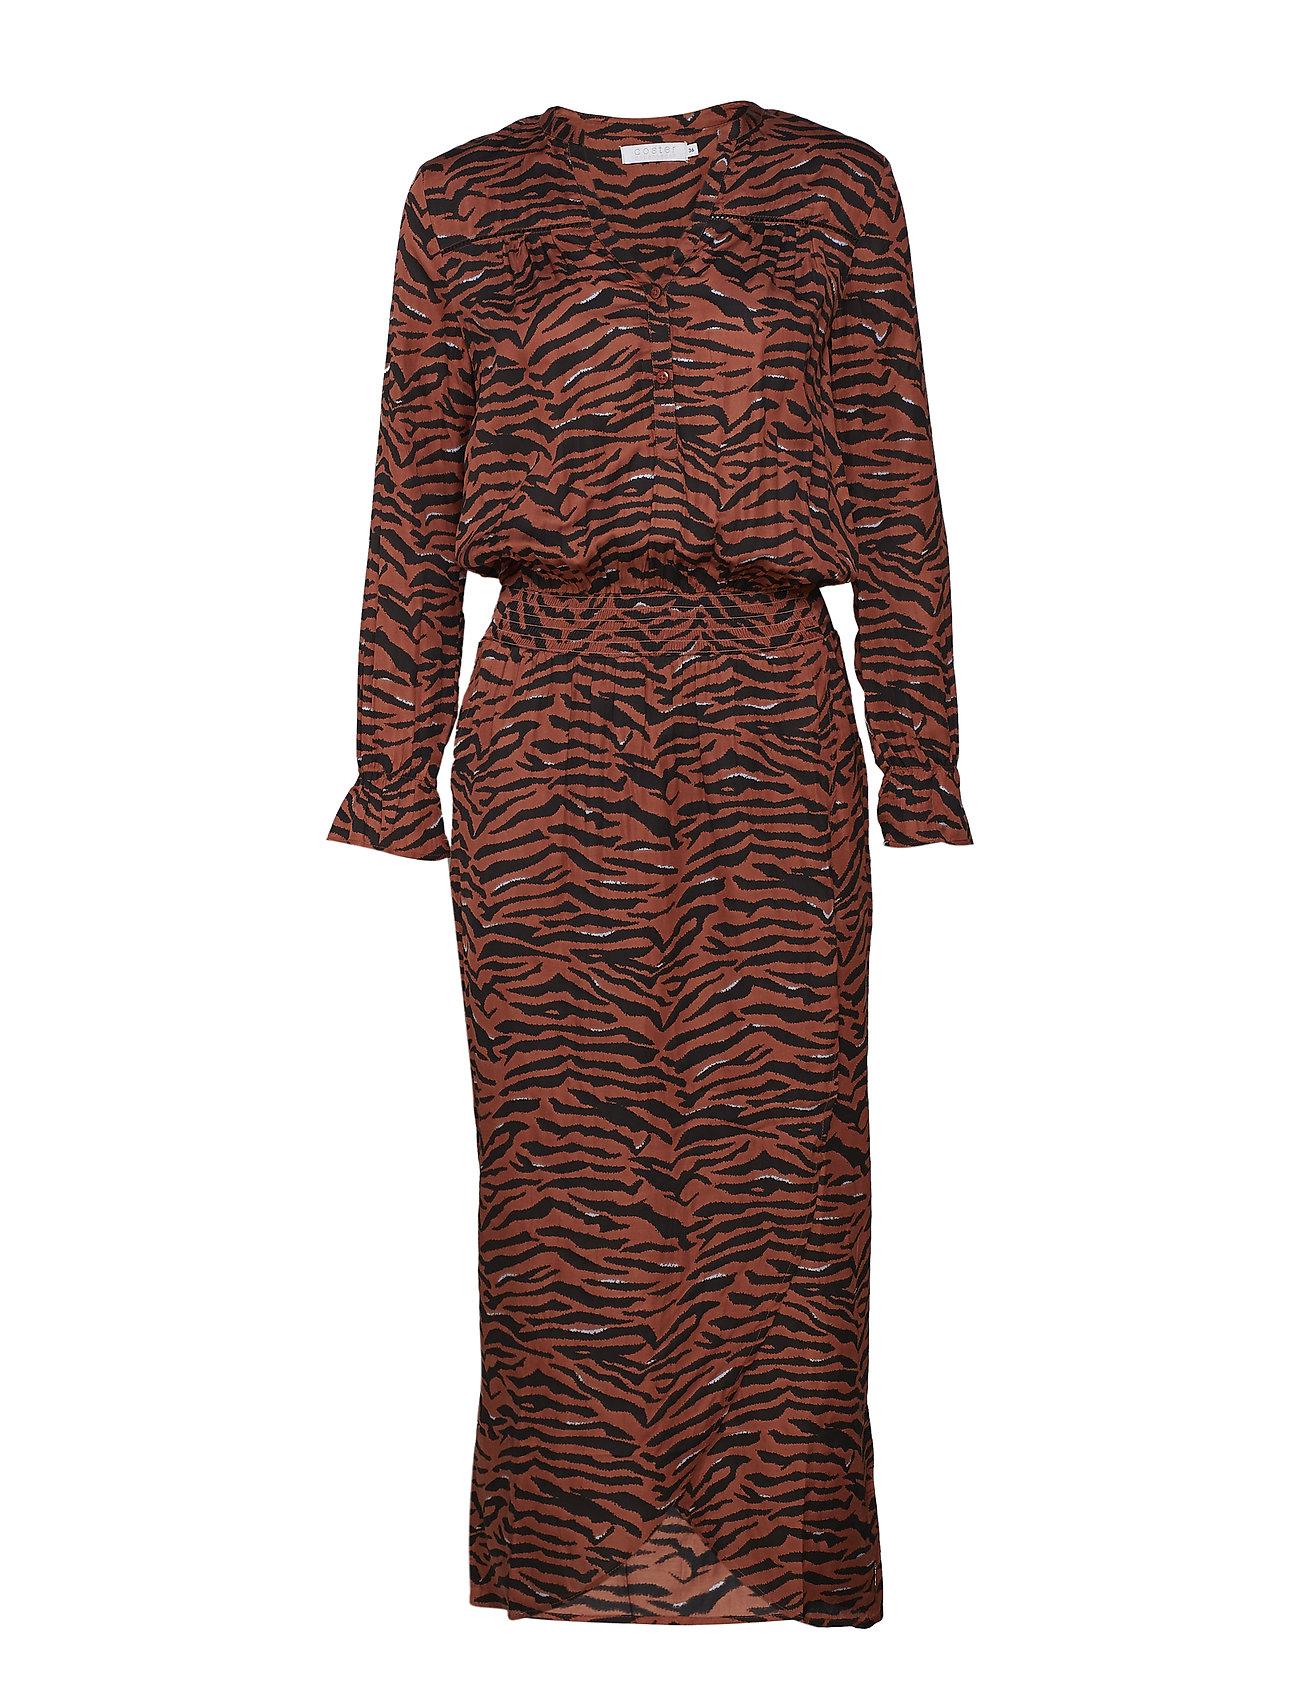 Dress W. Zebra Print - Coster Copenhagen